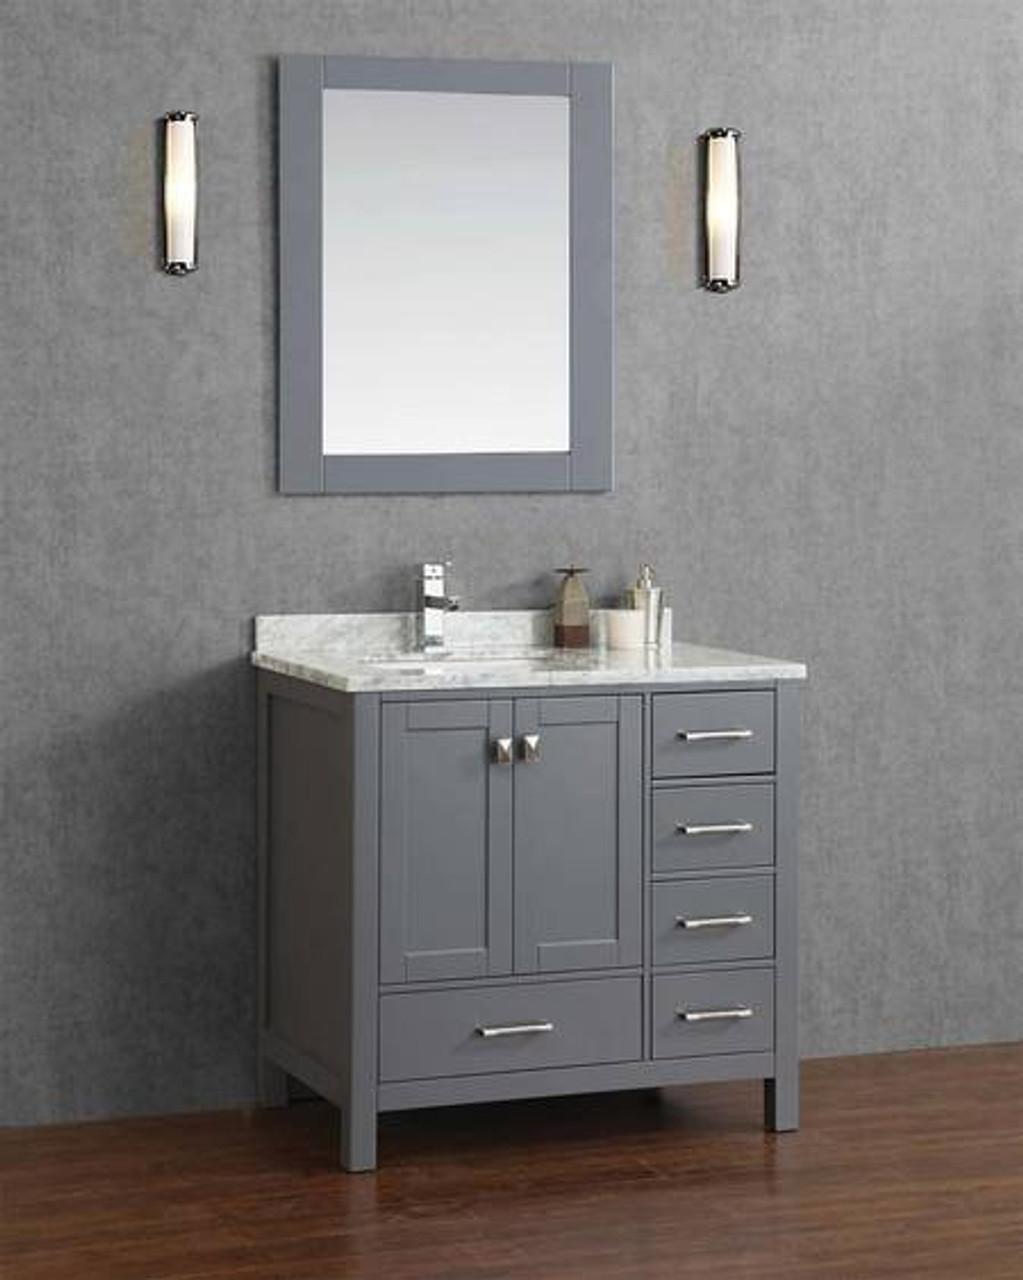 armada 44 bathroom vanity ice grey left hand sink